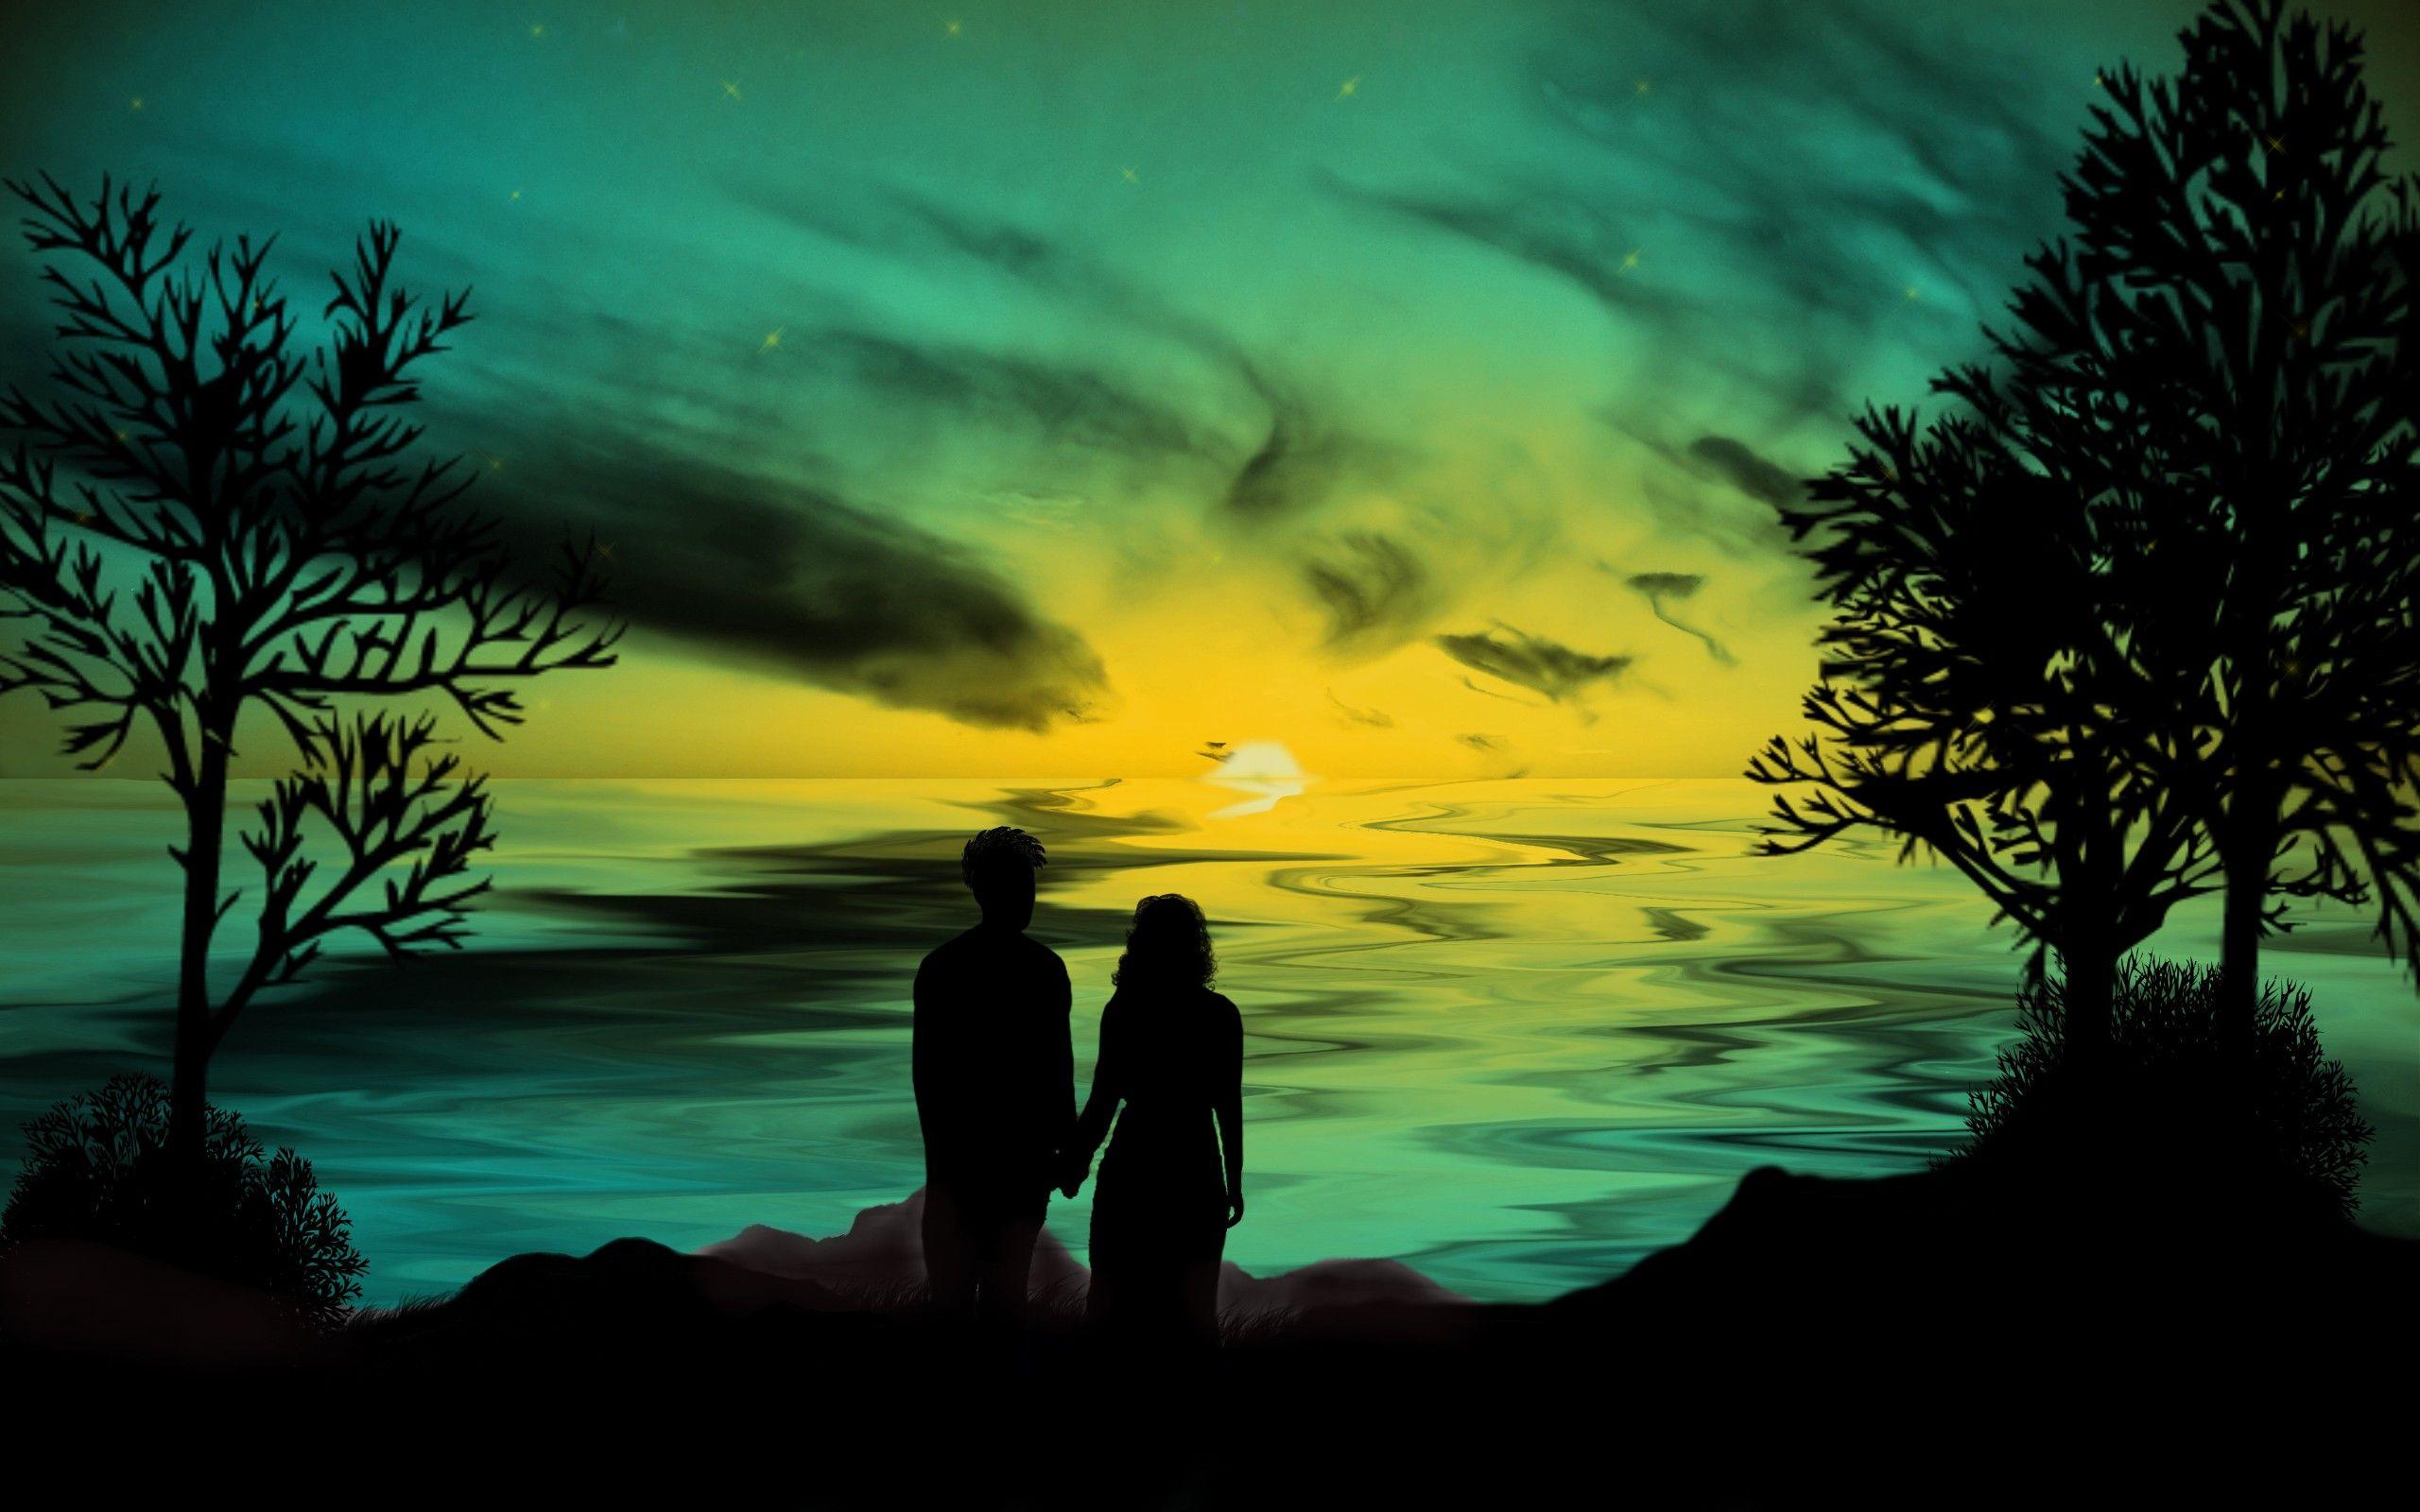 Hd wallpaper romantic - Wallpaper Hd Love Romantic For Romantic Men Women Design Inspiration Romantic Pinterest Romantic Wallpaper And Couple Wallpaper